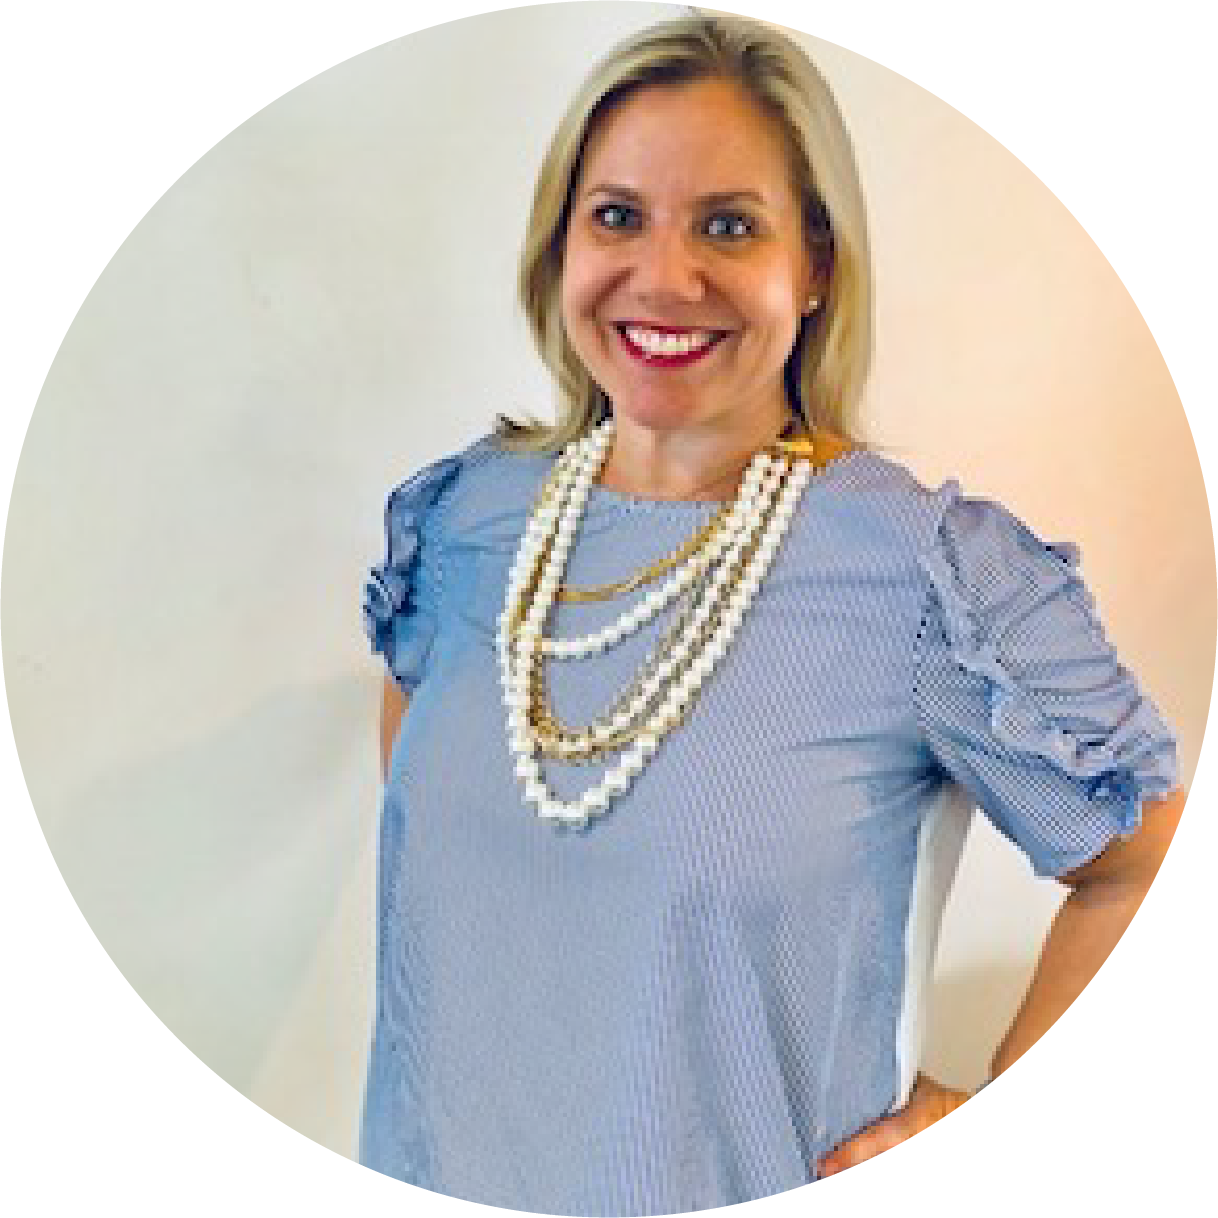 Nicole Shull, Speaker at Women Impact Tech